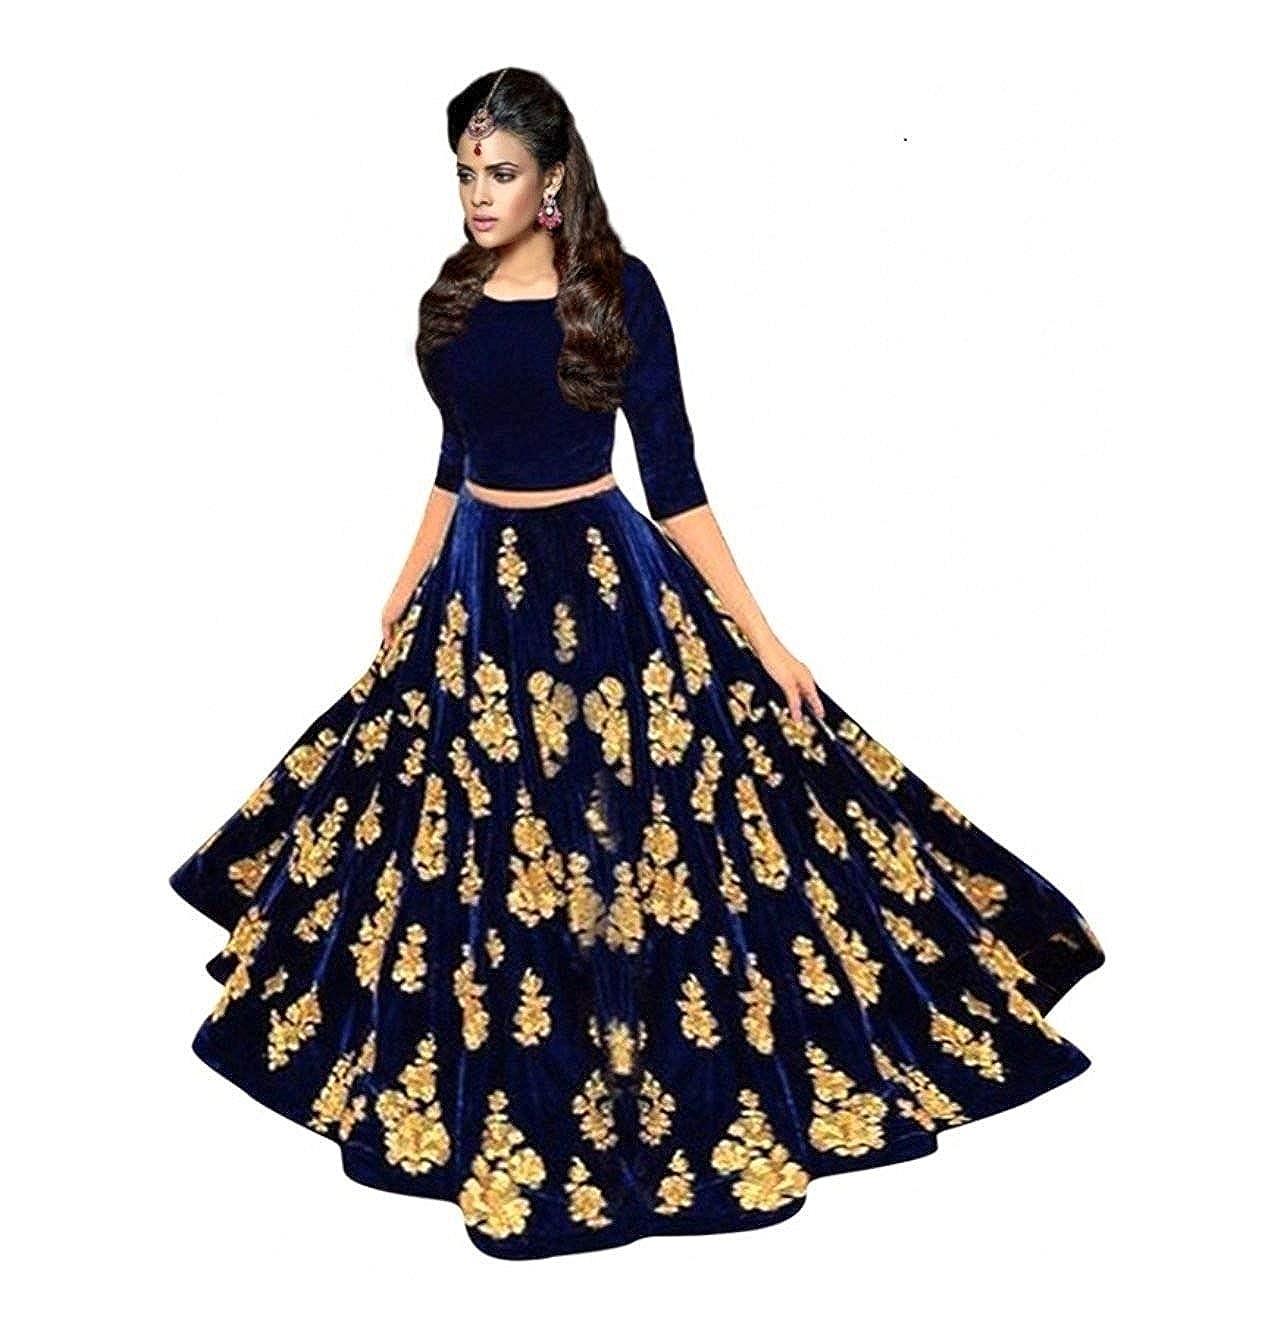 6e04700fa9 D C Creation Women's Velvet Long Skirt Gown And Top (Blue_ Free Size ...